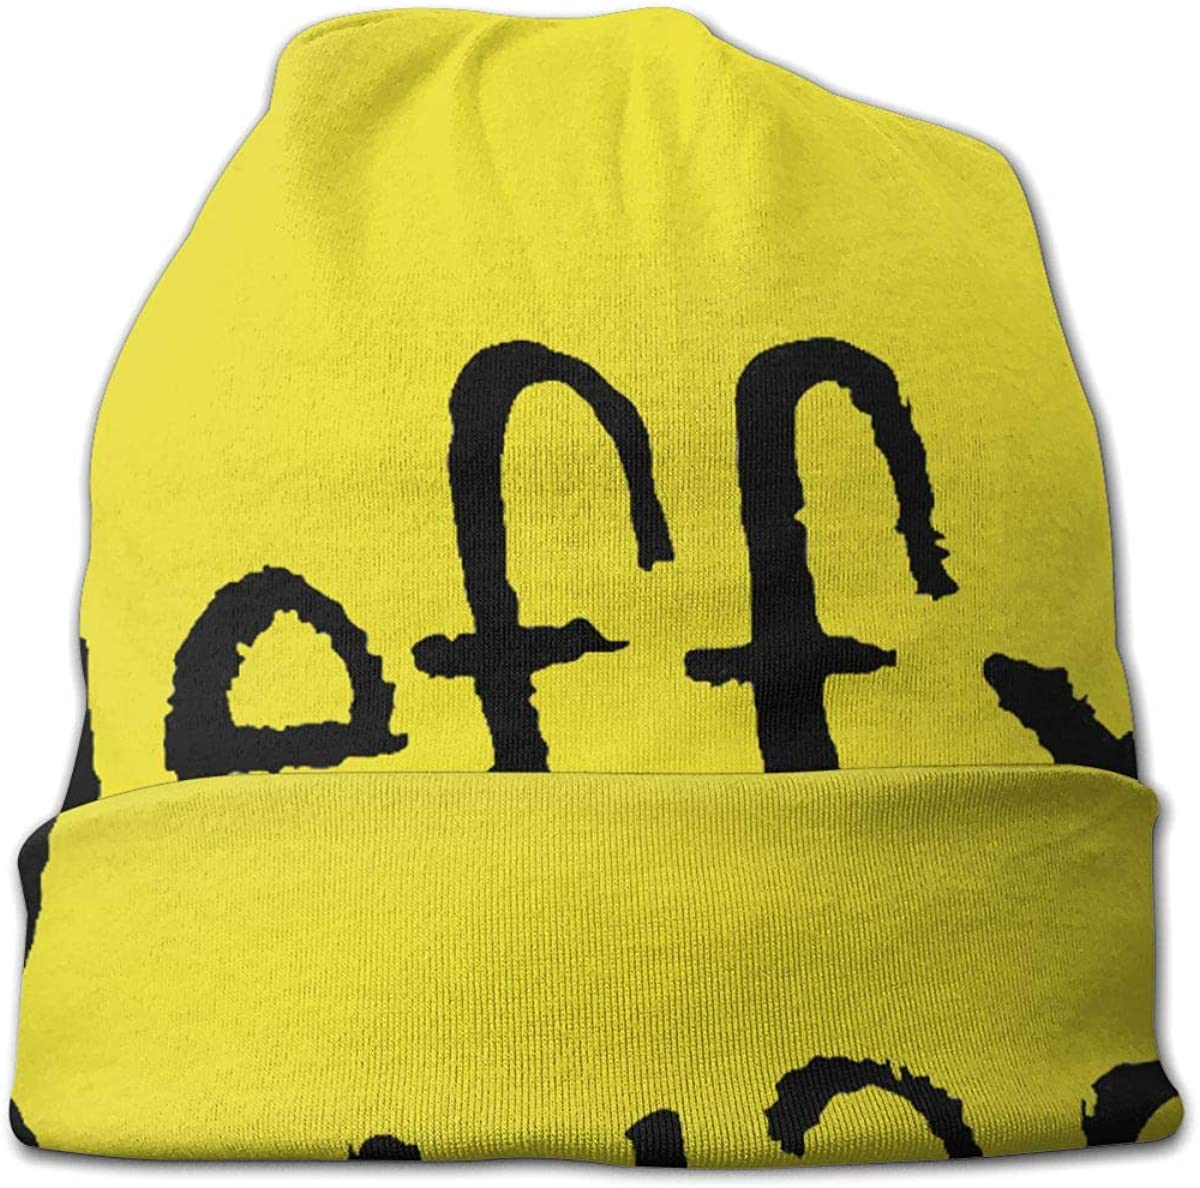 Jeffy Beanies for Guys Fashion Knit Hat for Unisex Novelty Gift Black Cap Hedging Hat